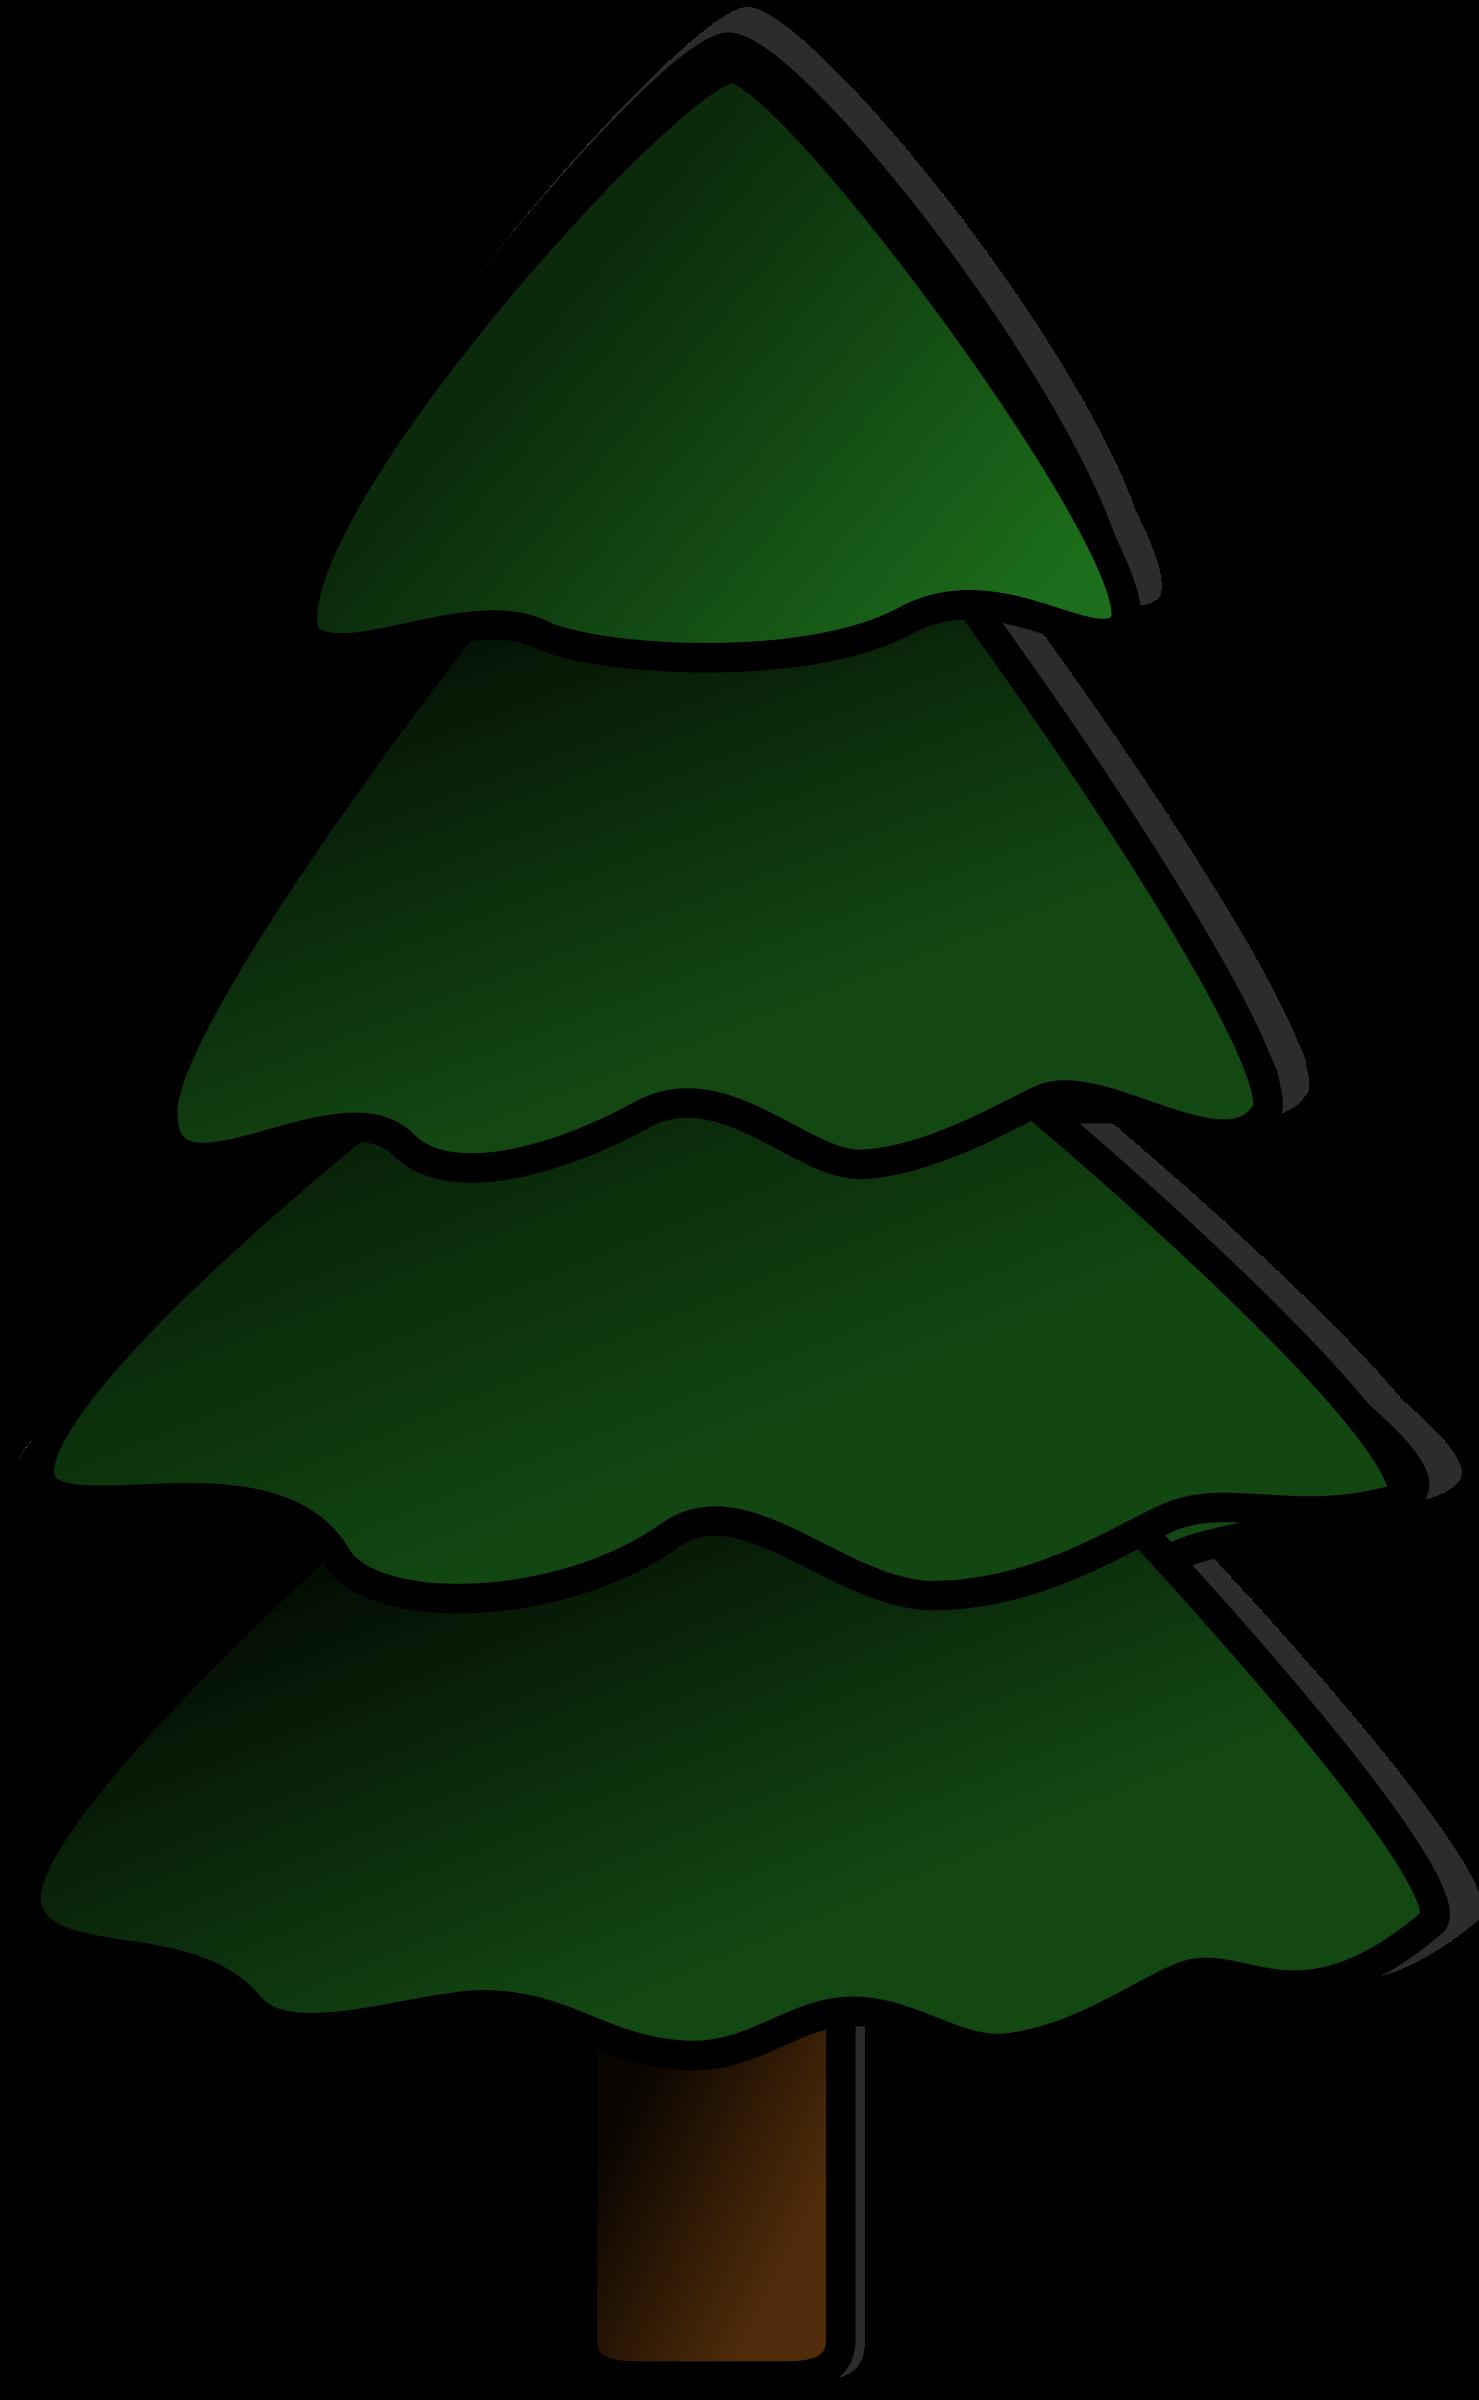 clip-art-pine-tree-pine-tree-clipart-harmonic_Tree.png